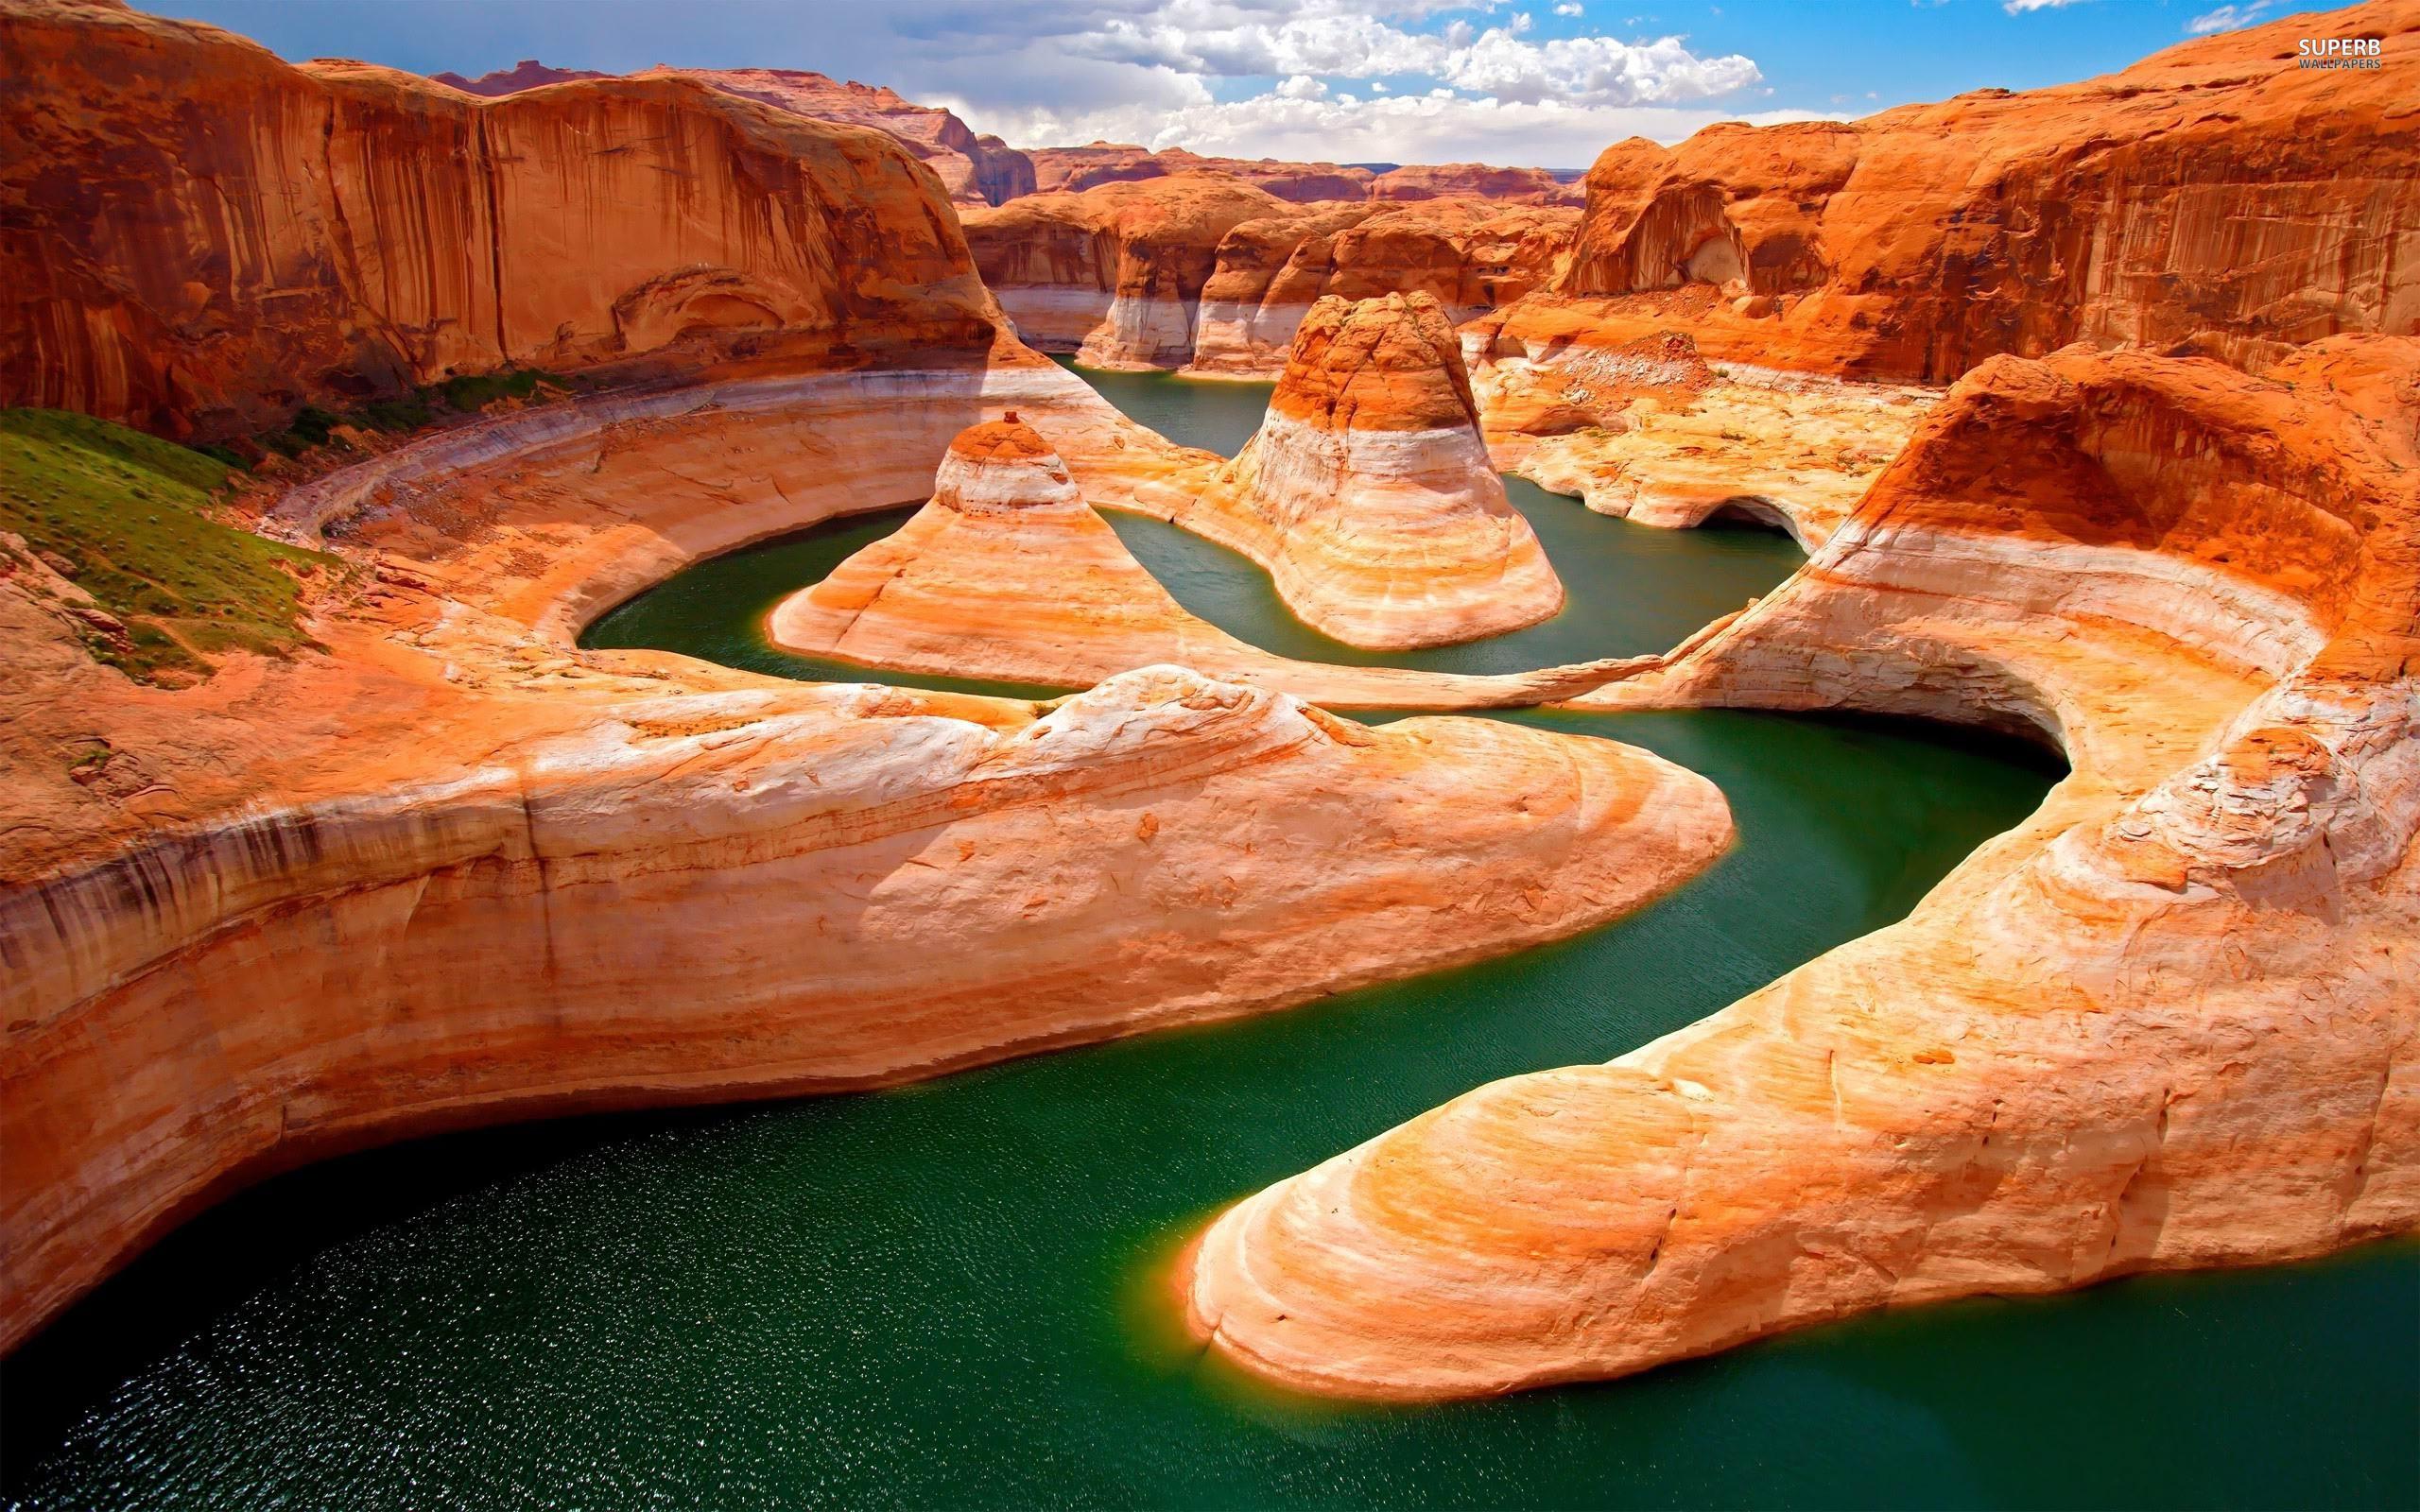 Colorado Wallpaper: Outstanding Wallpaper Free Colorado River Desktop 2560x1600px